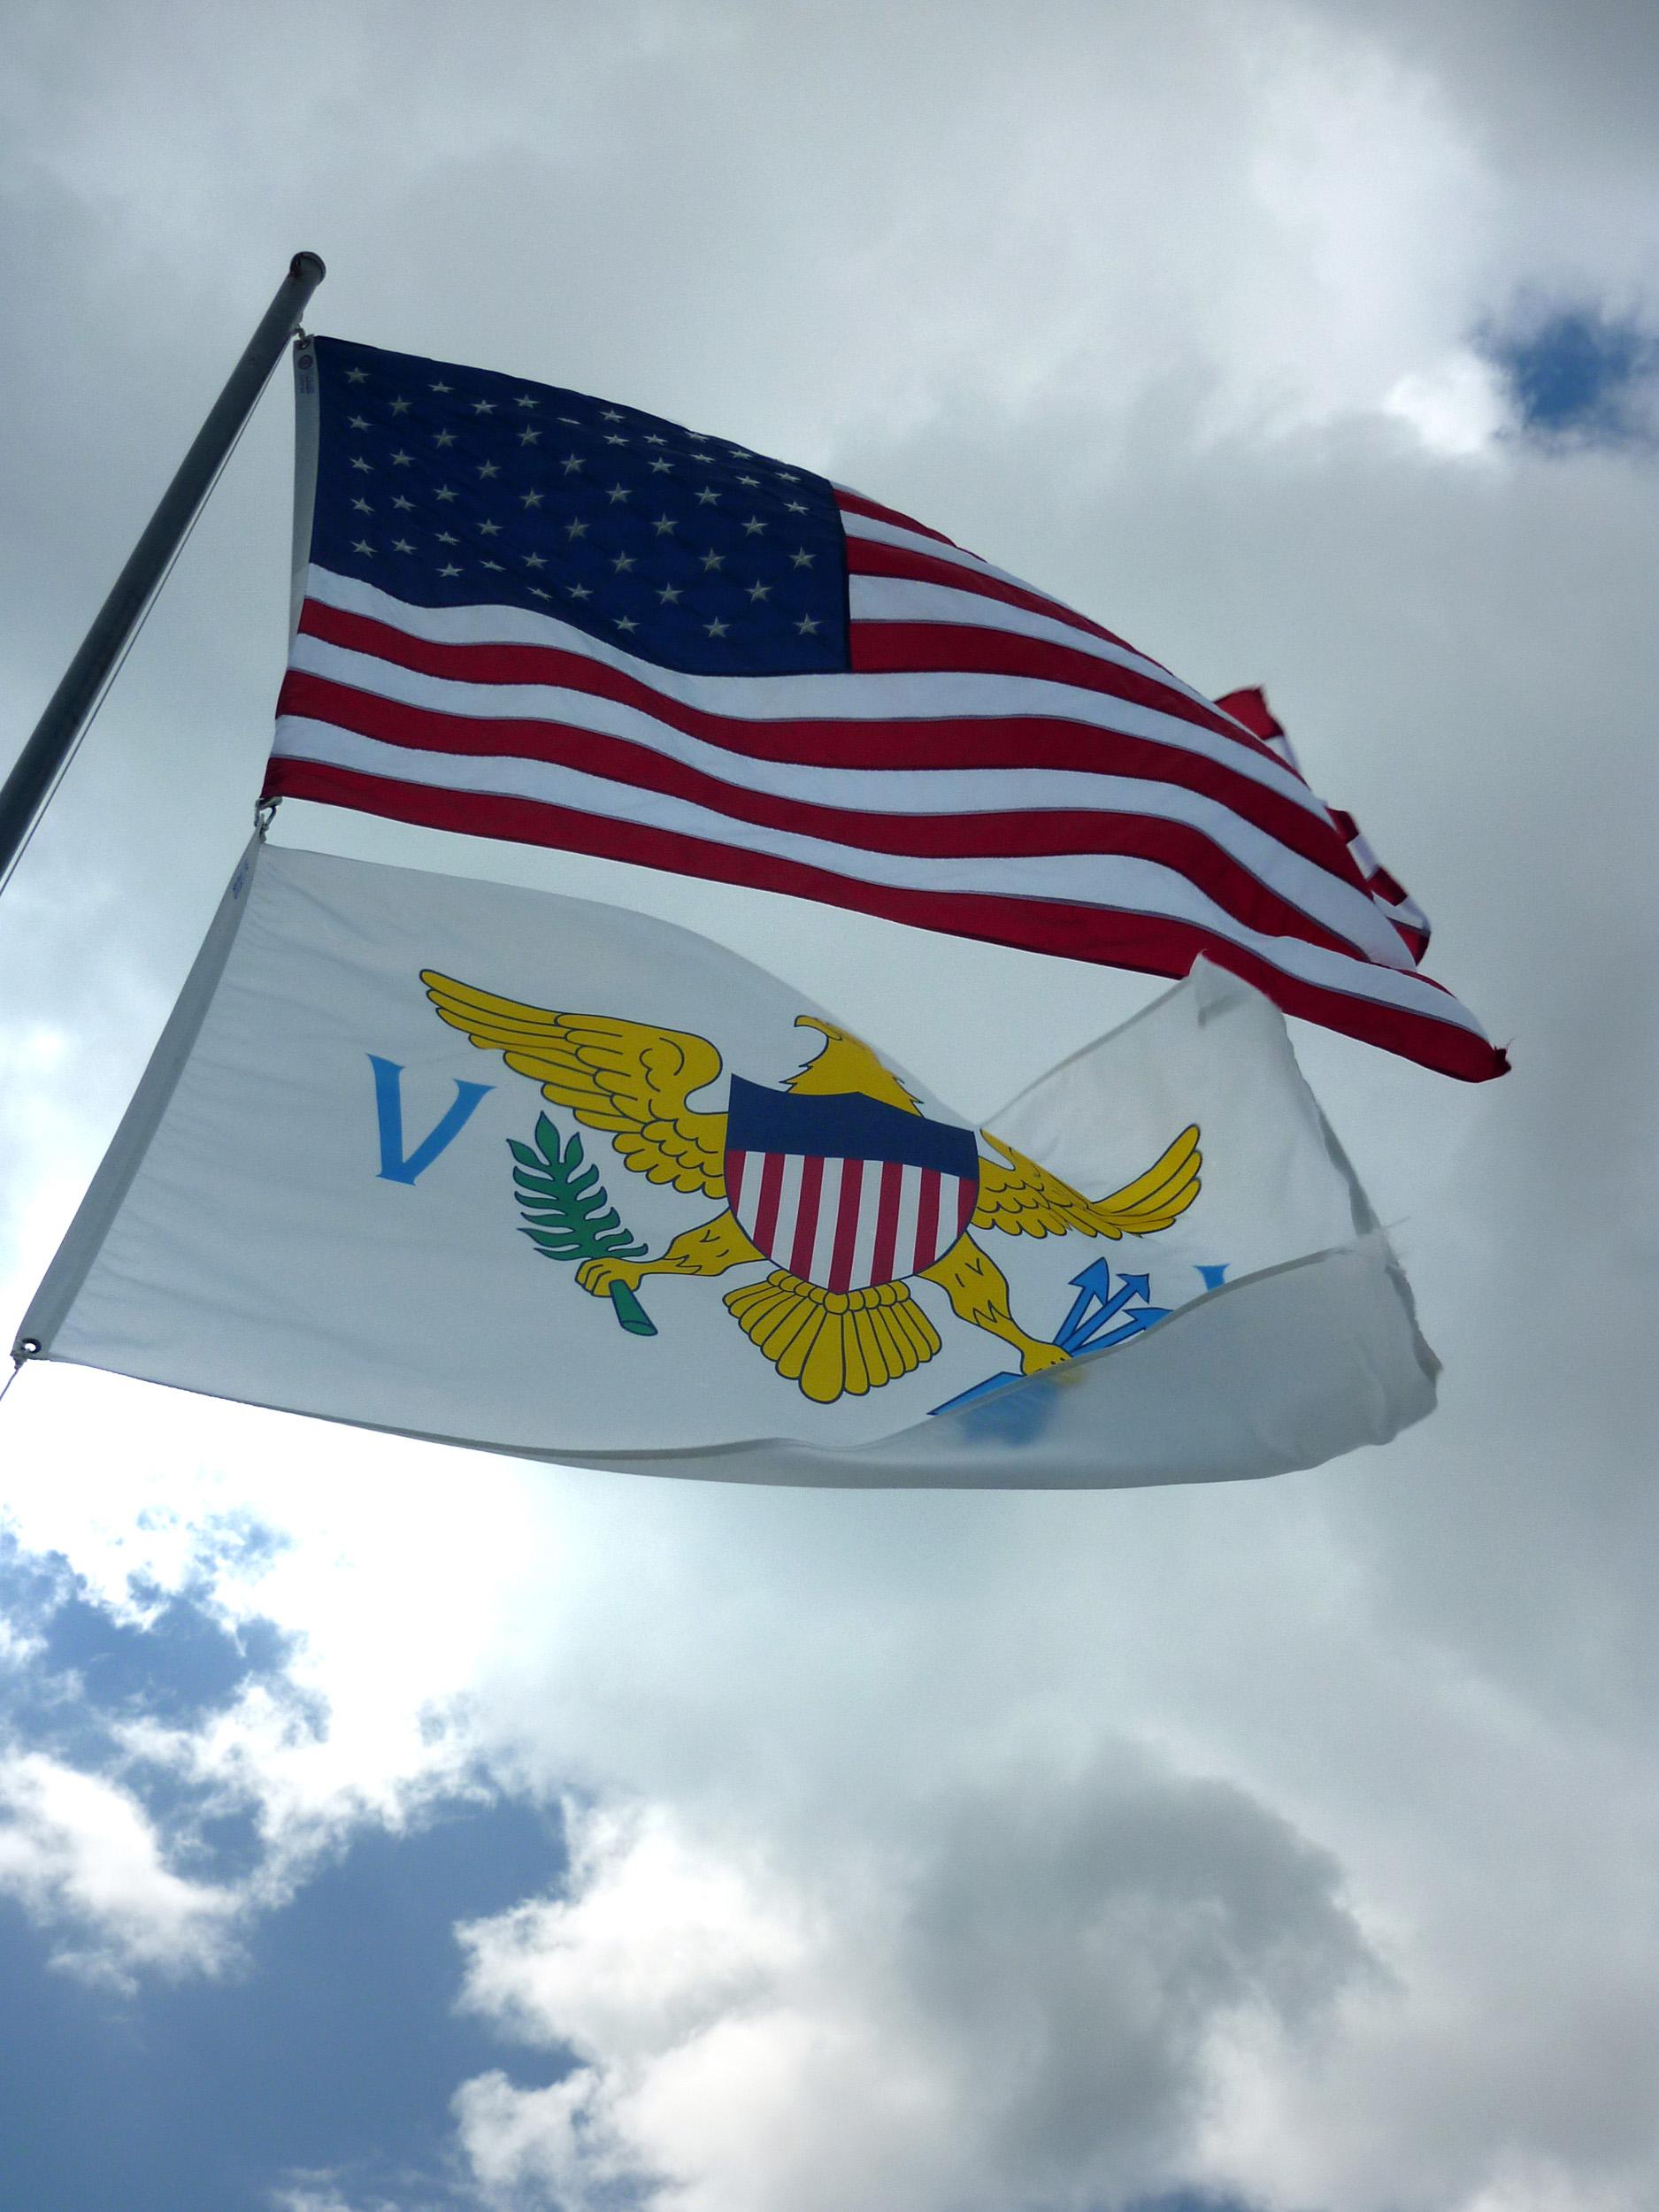 Free Stock photo of Virgin islands flags | Photoeverywhere